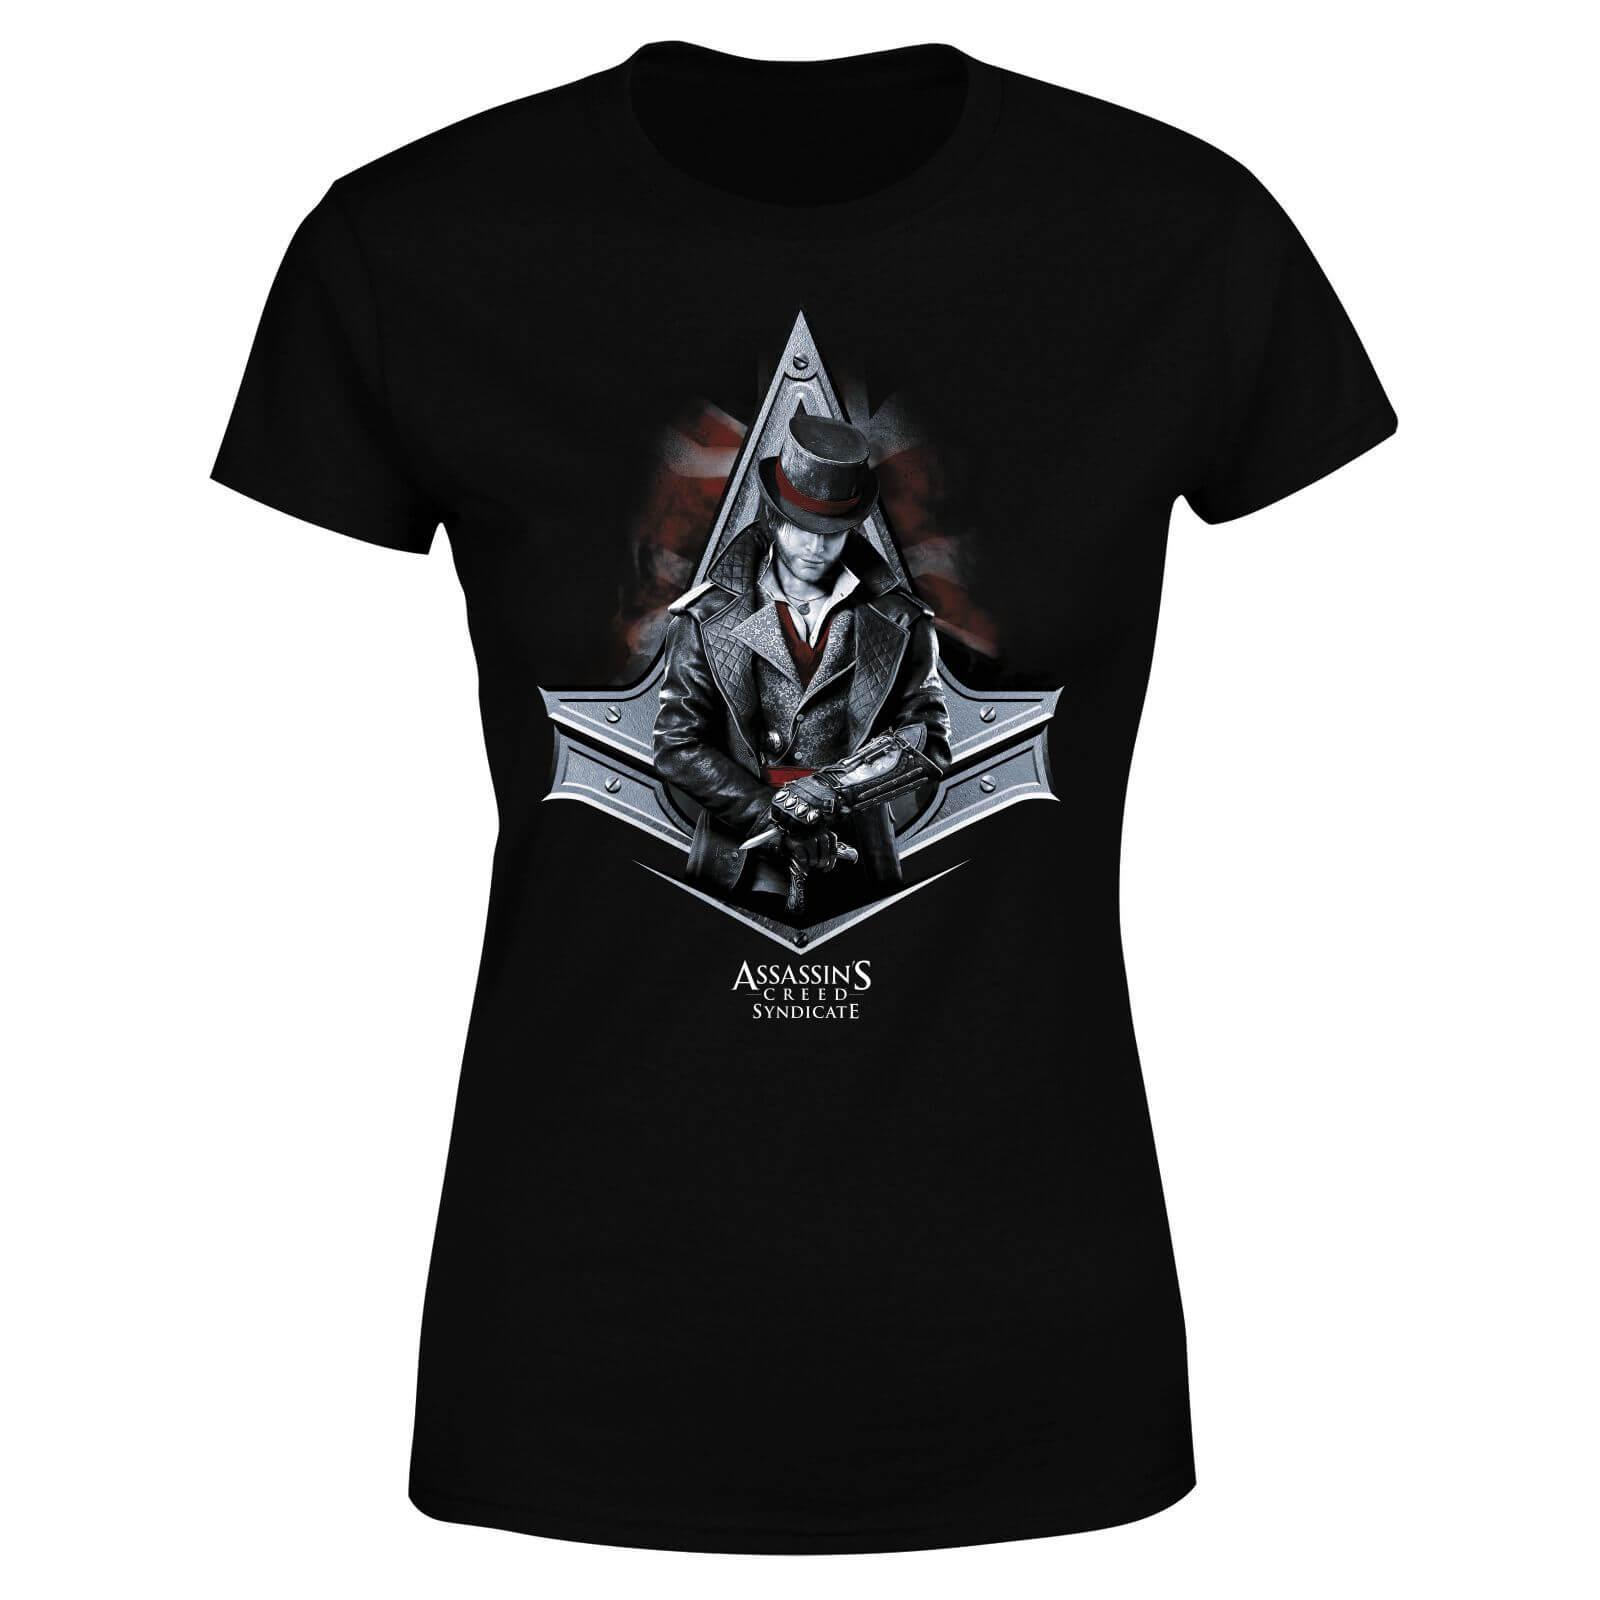 Assassin's Creed T-Shirt Femme Jacob Assassin's Creed Syndicate - Noir - S - Noir